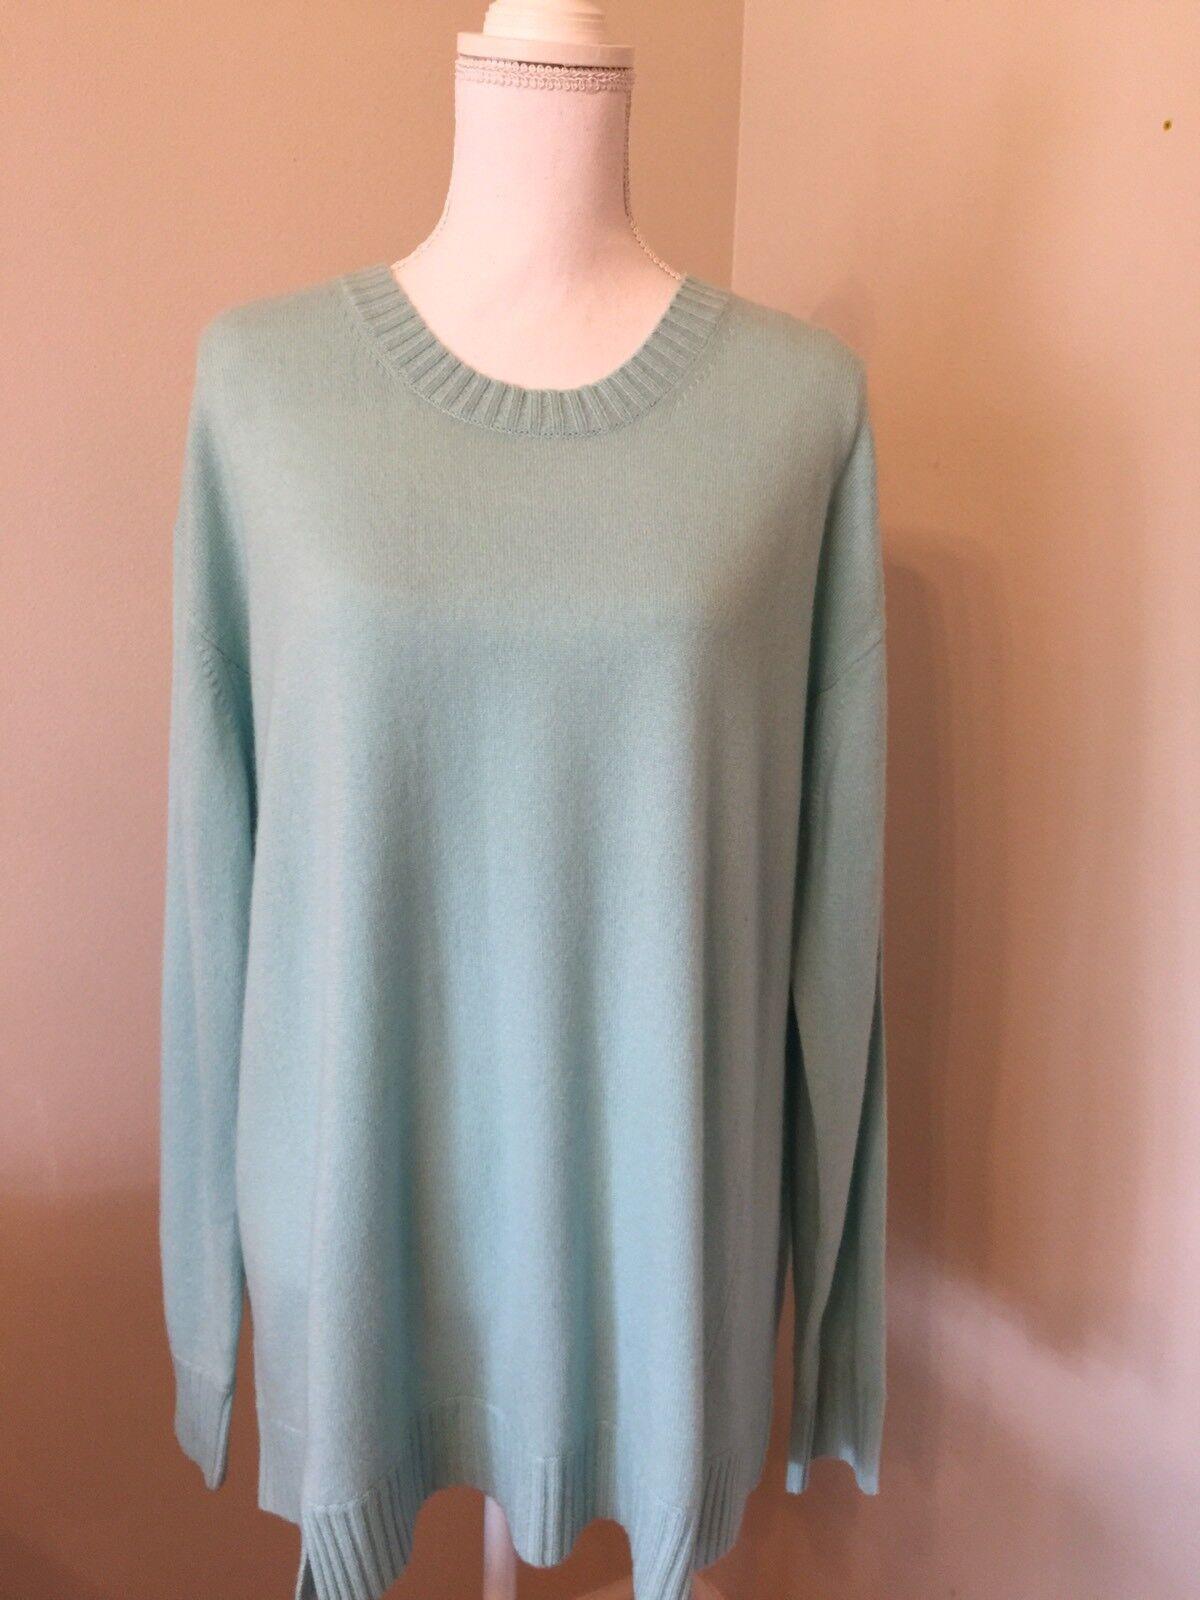 J Crew Collection Italian Cashmere Side-panel Sweater Sz Xl Aqua bluee B8552 NWT